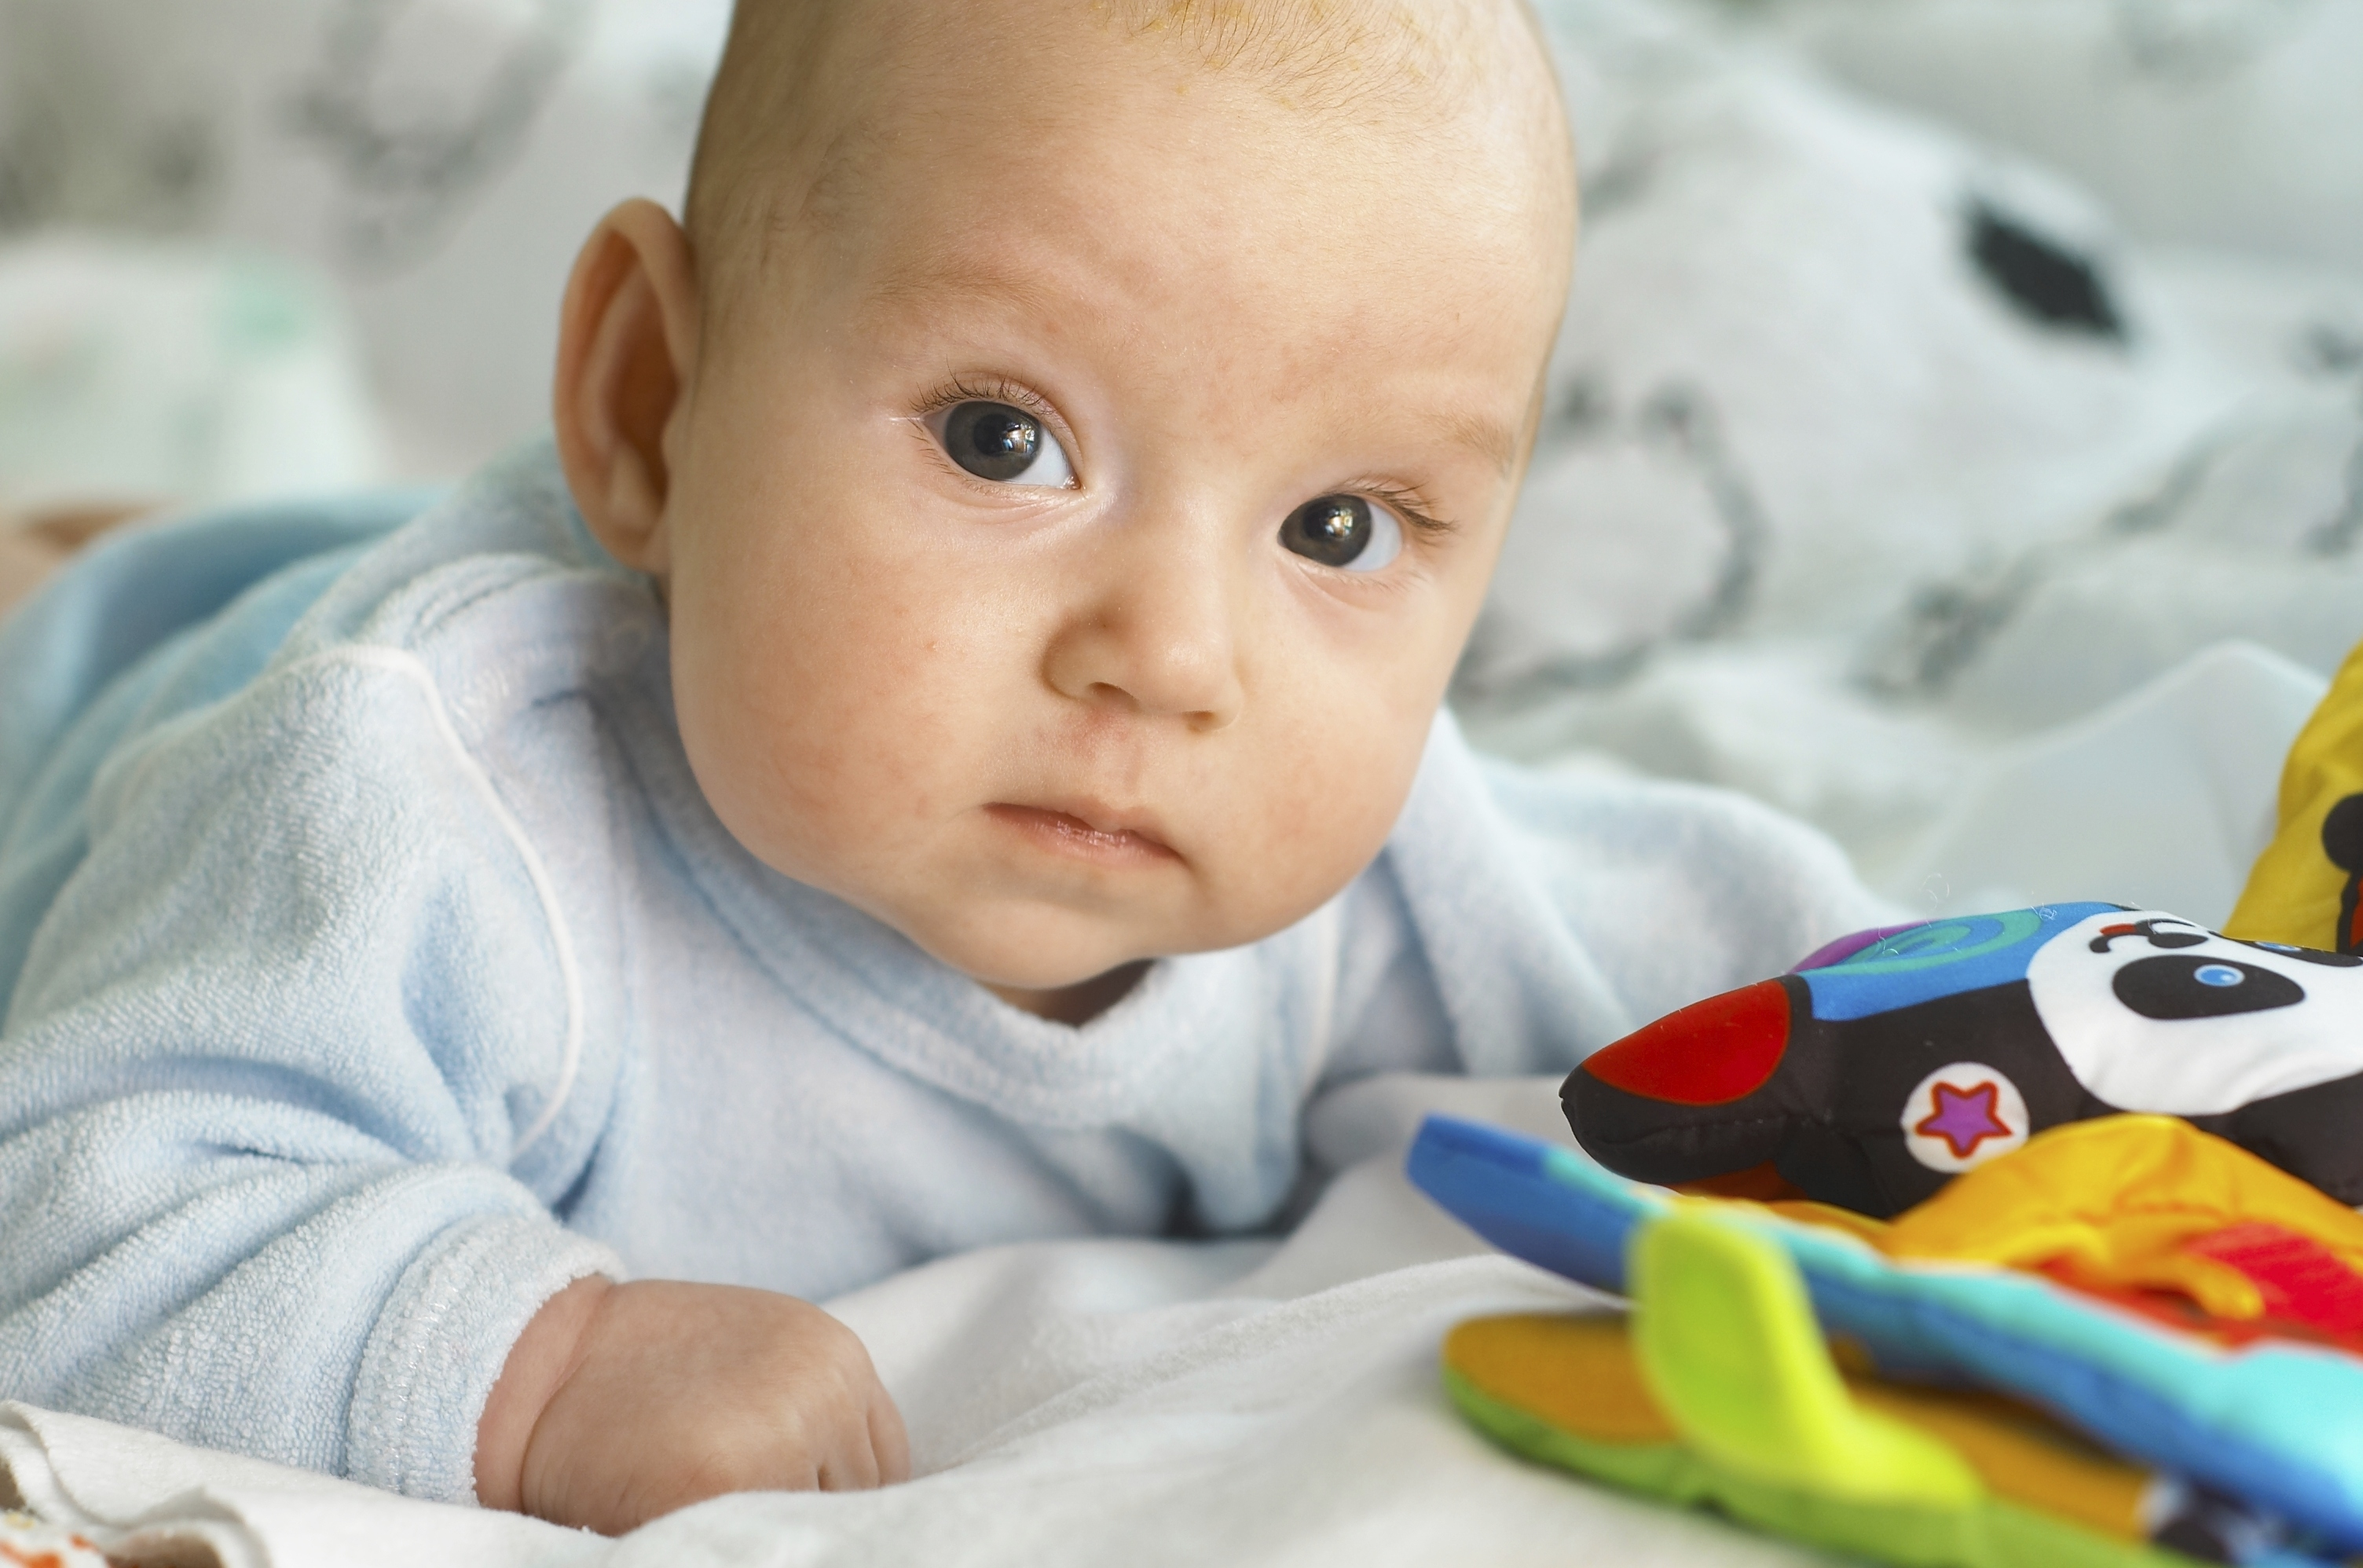 Loose Neck Skin in Infants